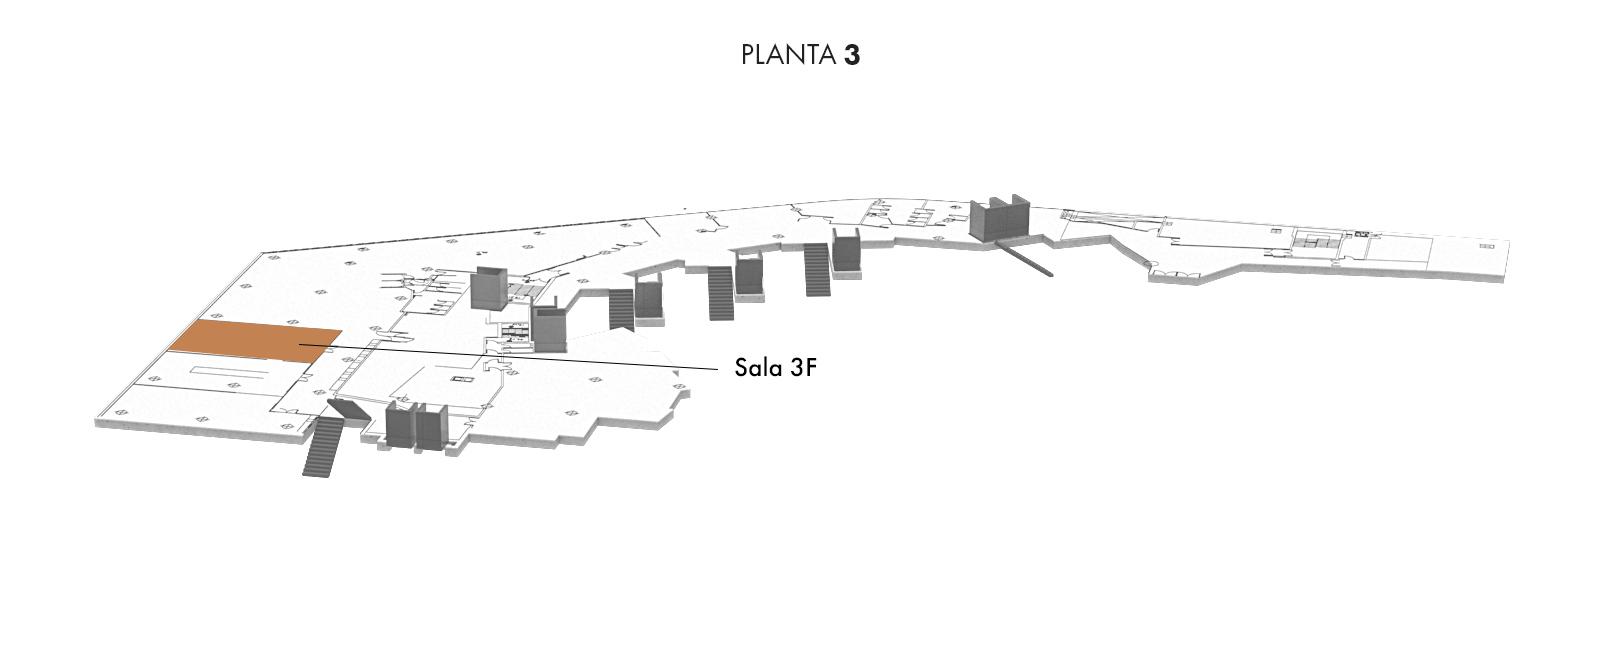 Sala 3F, Planta 3 | Palacio Euskalduna Jauregia